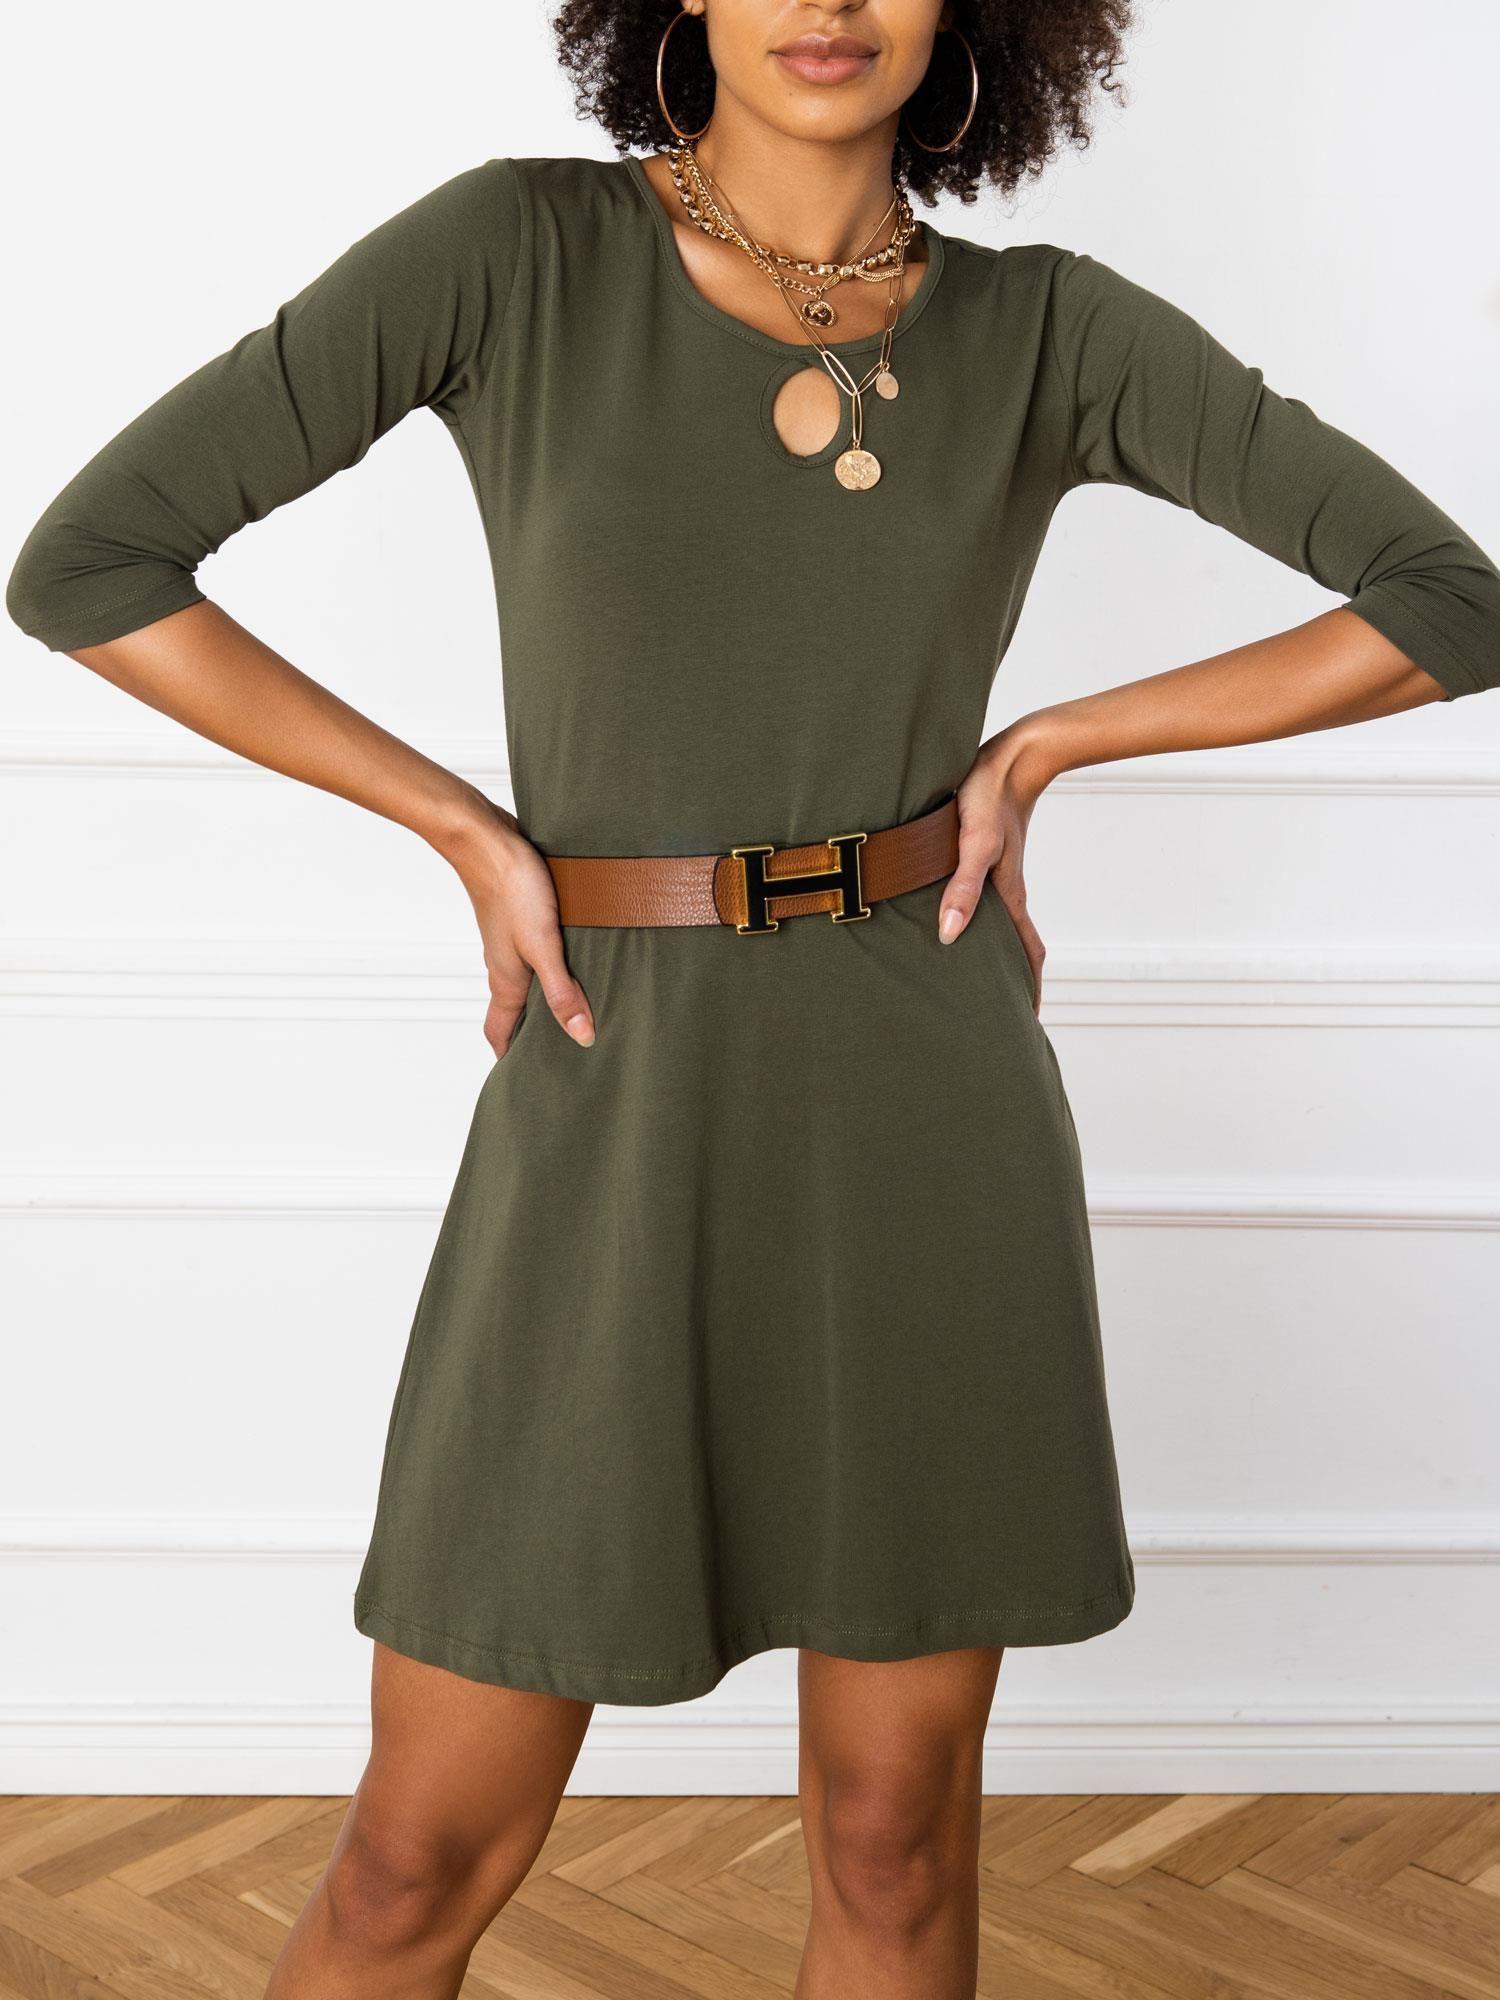 Jednoduché krátke kaki šaty - M